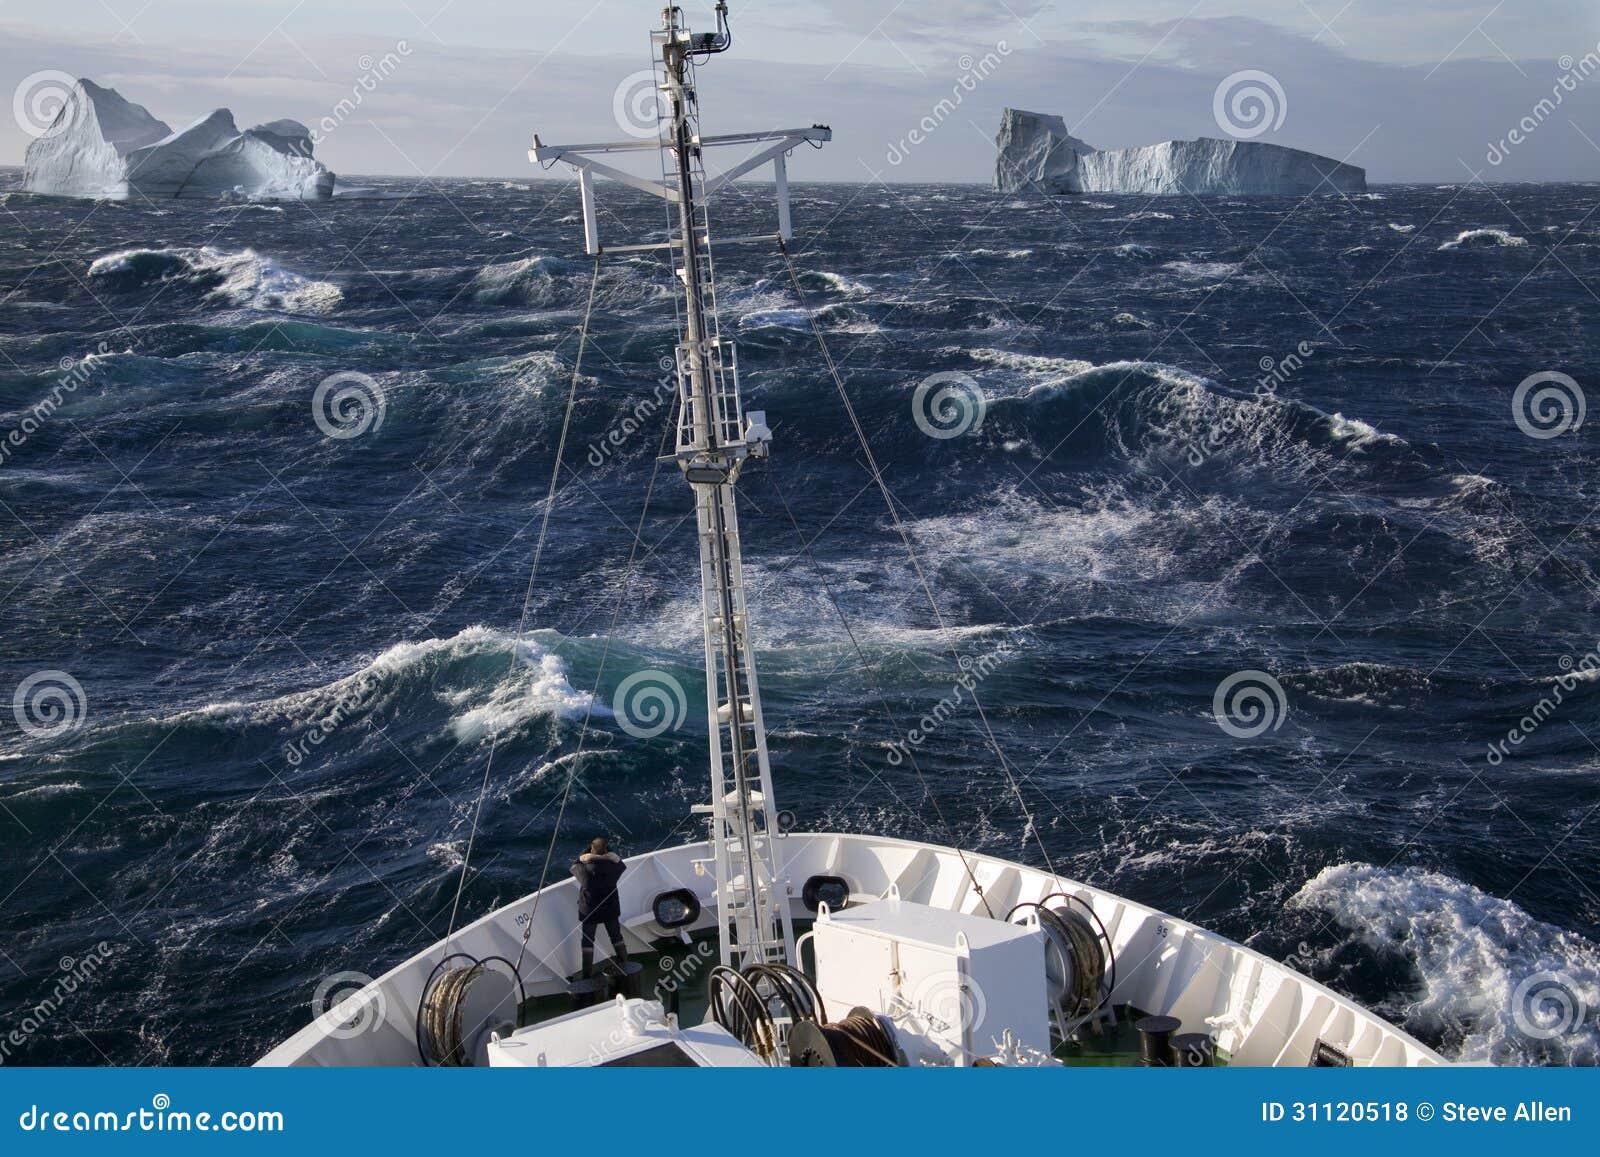 - Navio e iceberg - Gronelândia ártico